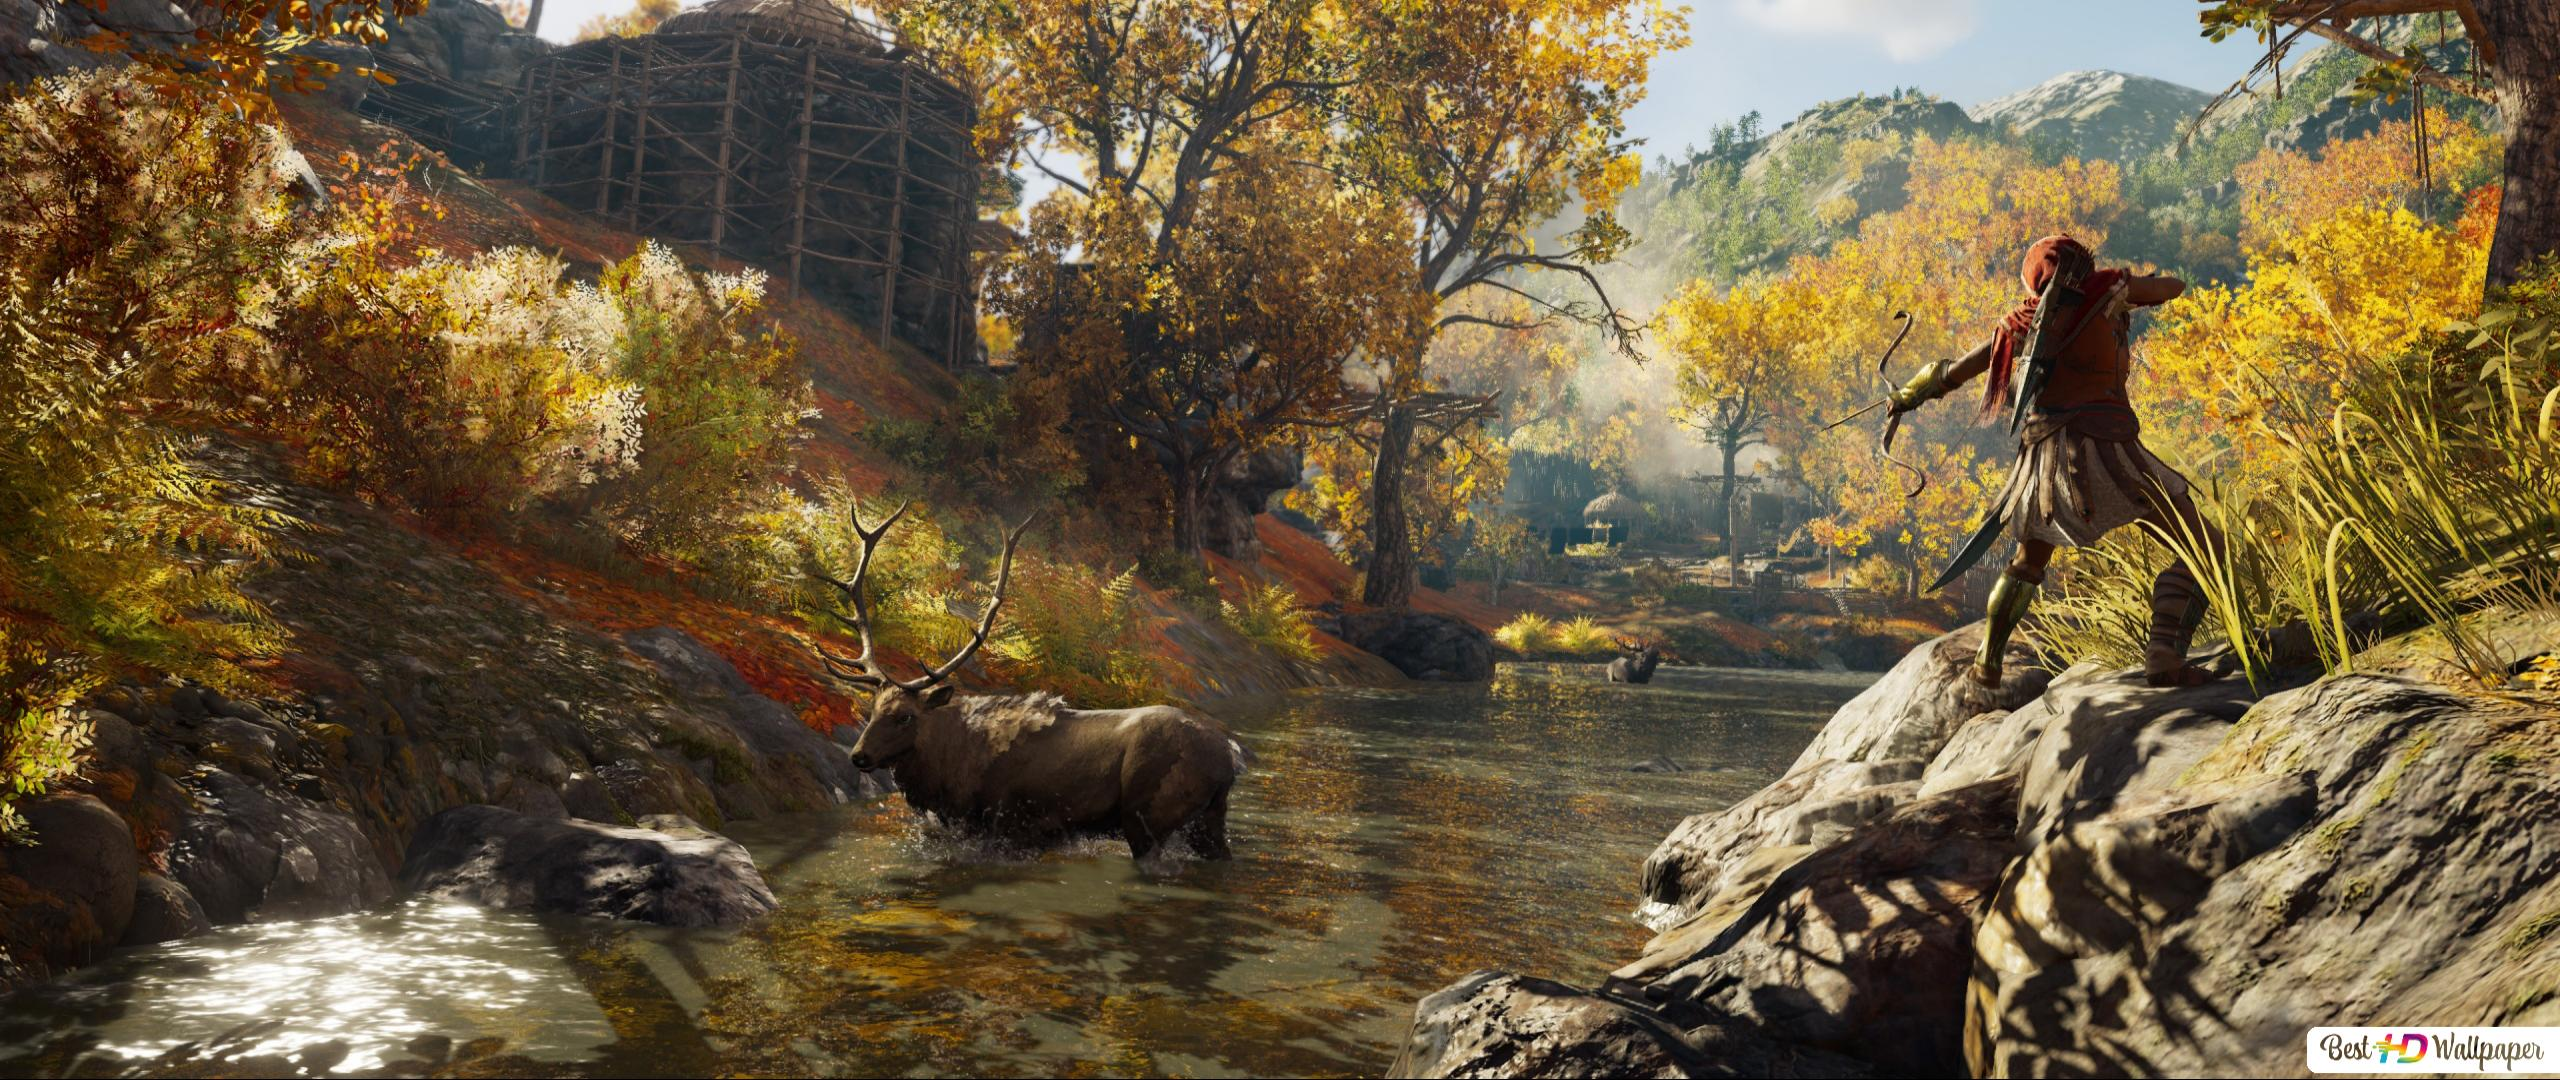 assassin-s-creed-odyssey-archer-hunting-moose-wallpaper-2560x1080-15684_14.jpg